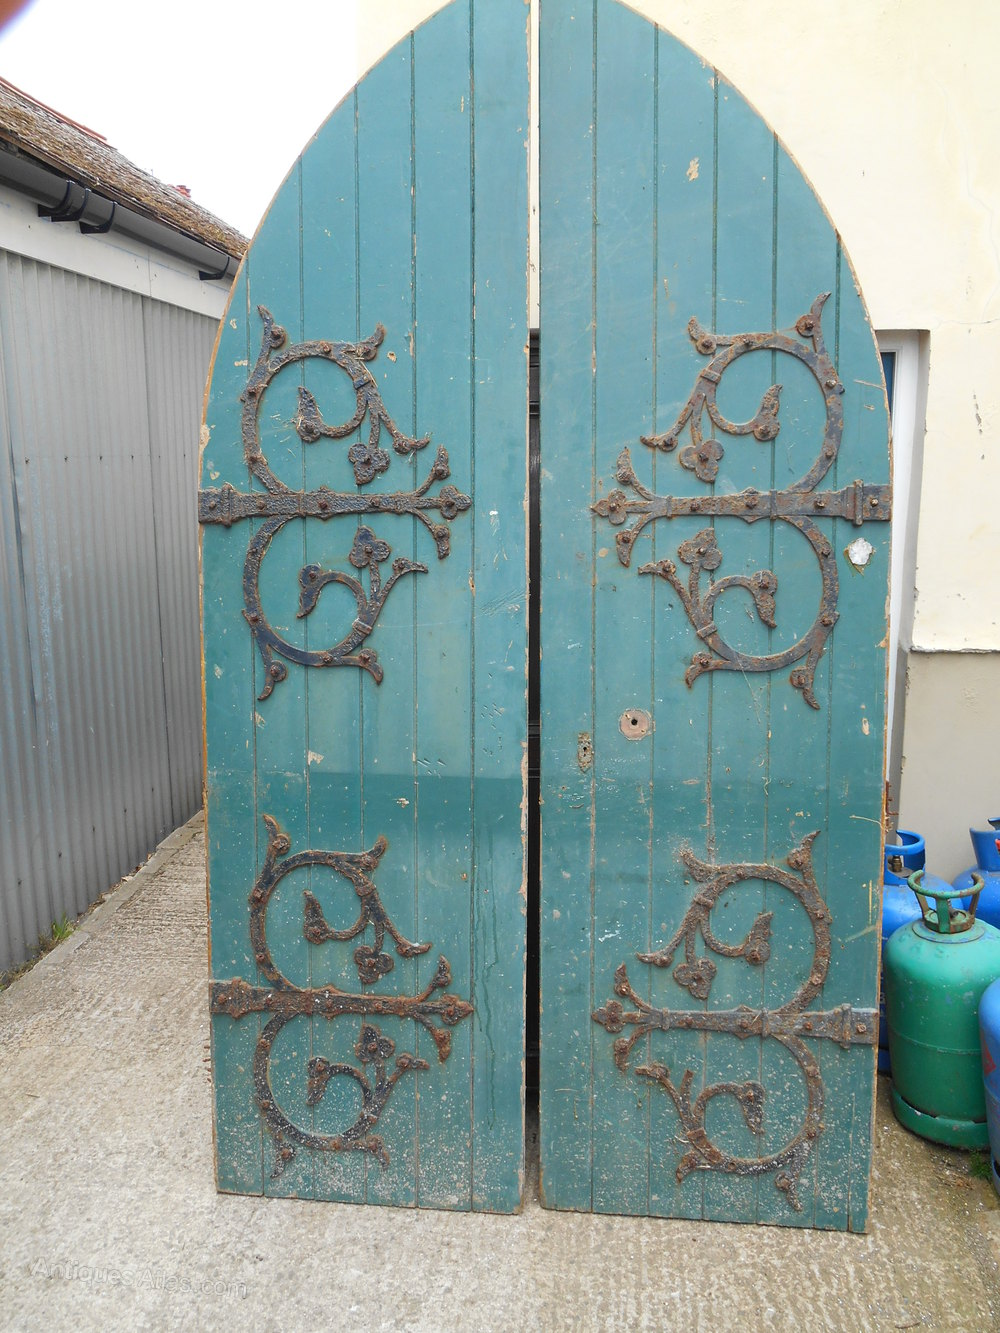 Antique Victorian Church Doors ... - Antiques Atlas - Antique Victorian Church Doors